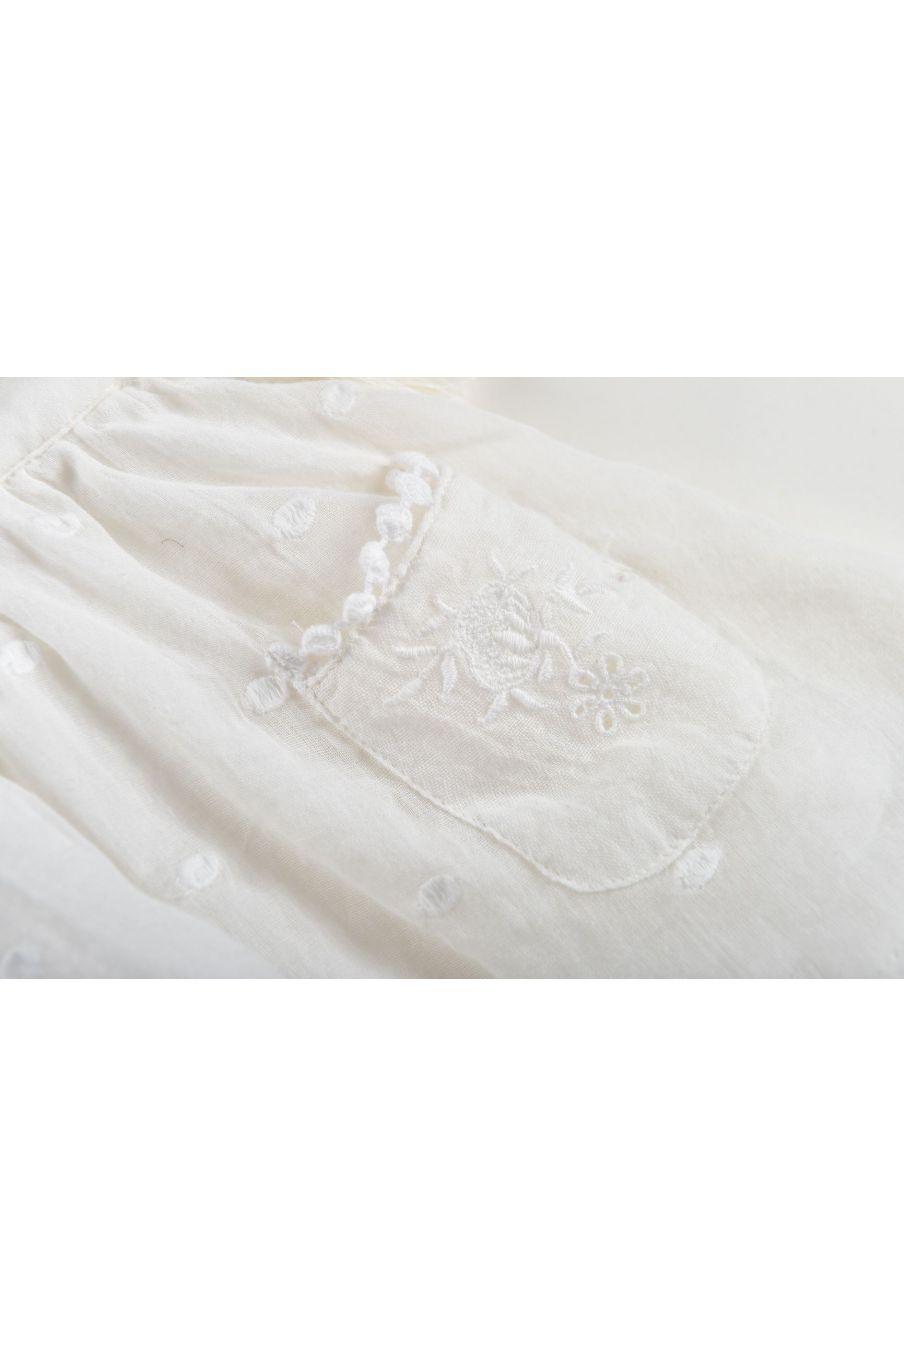 boheme chic vintage robe fille huguette off-white plumetis